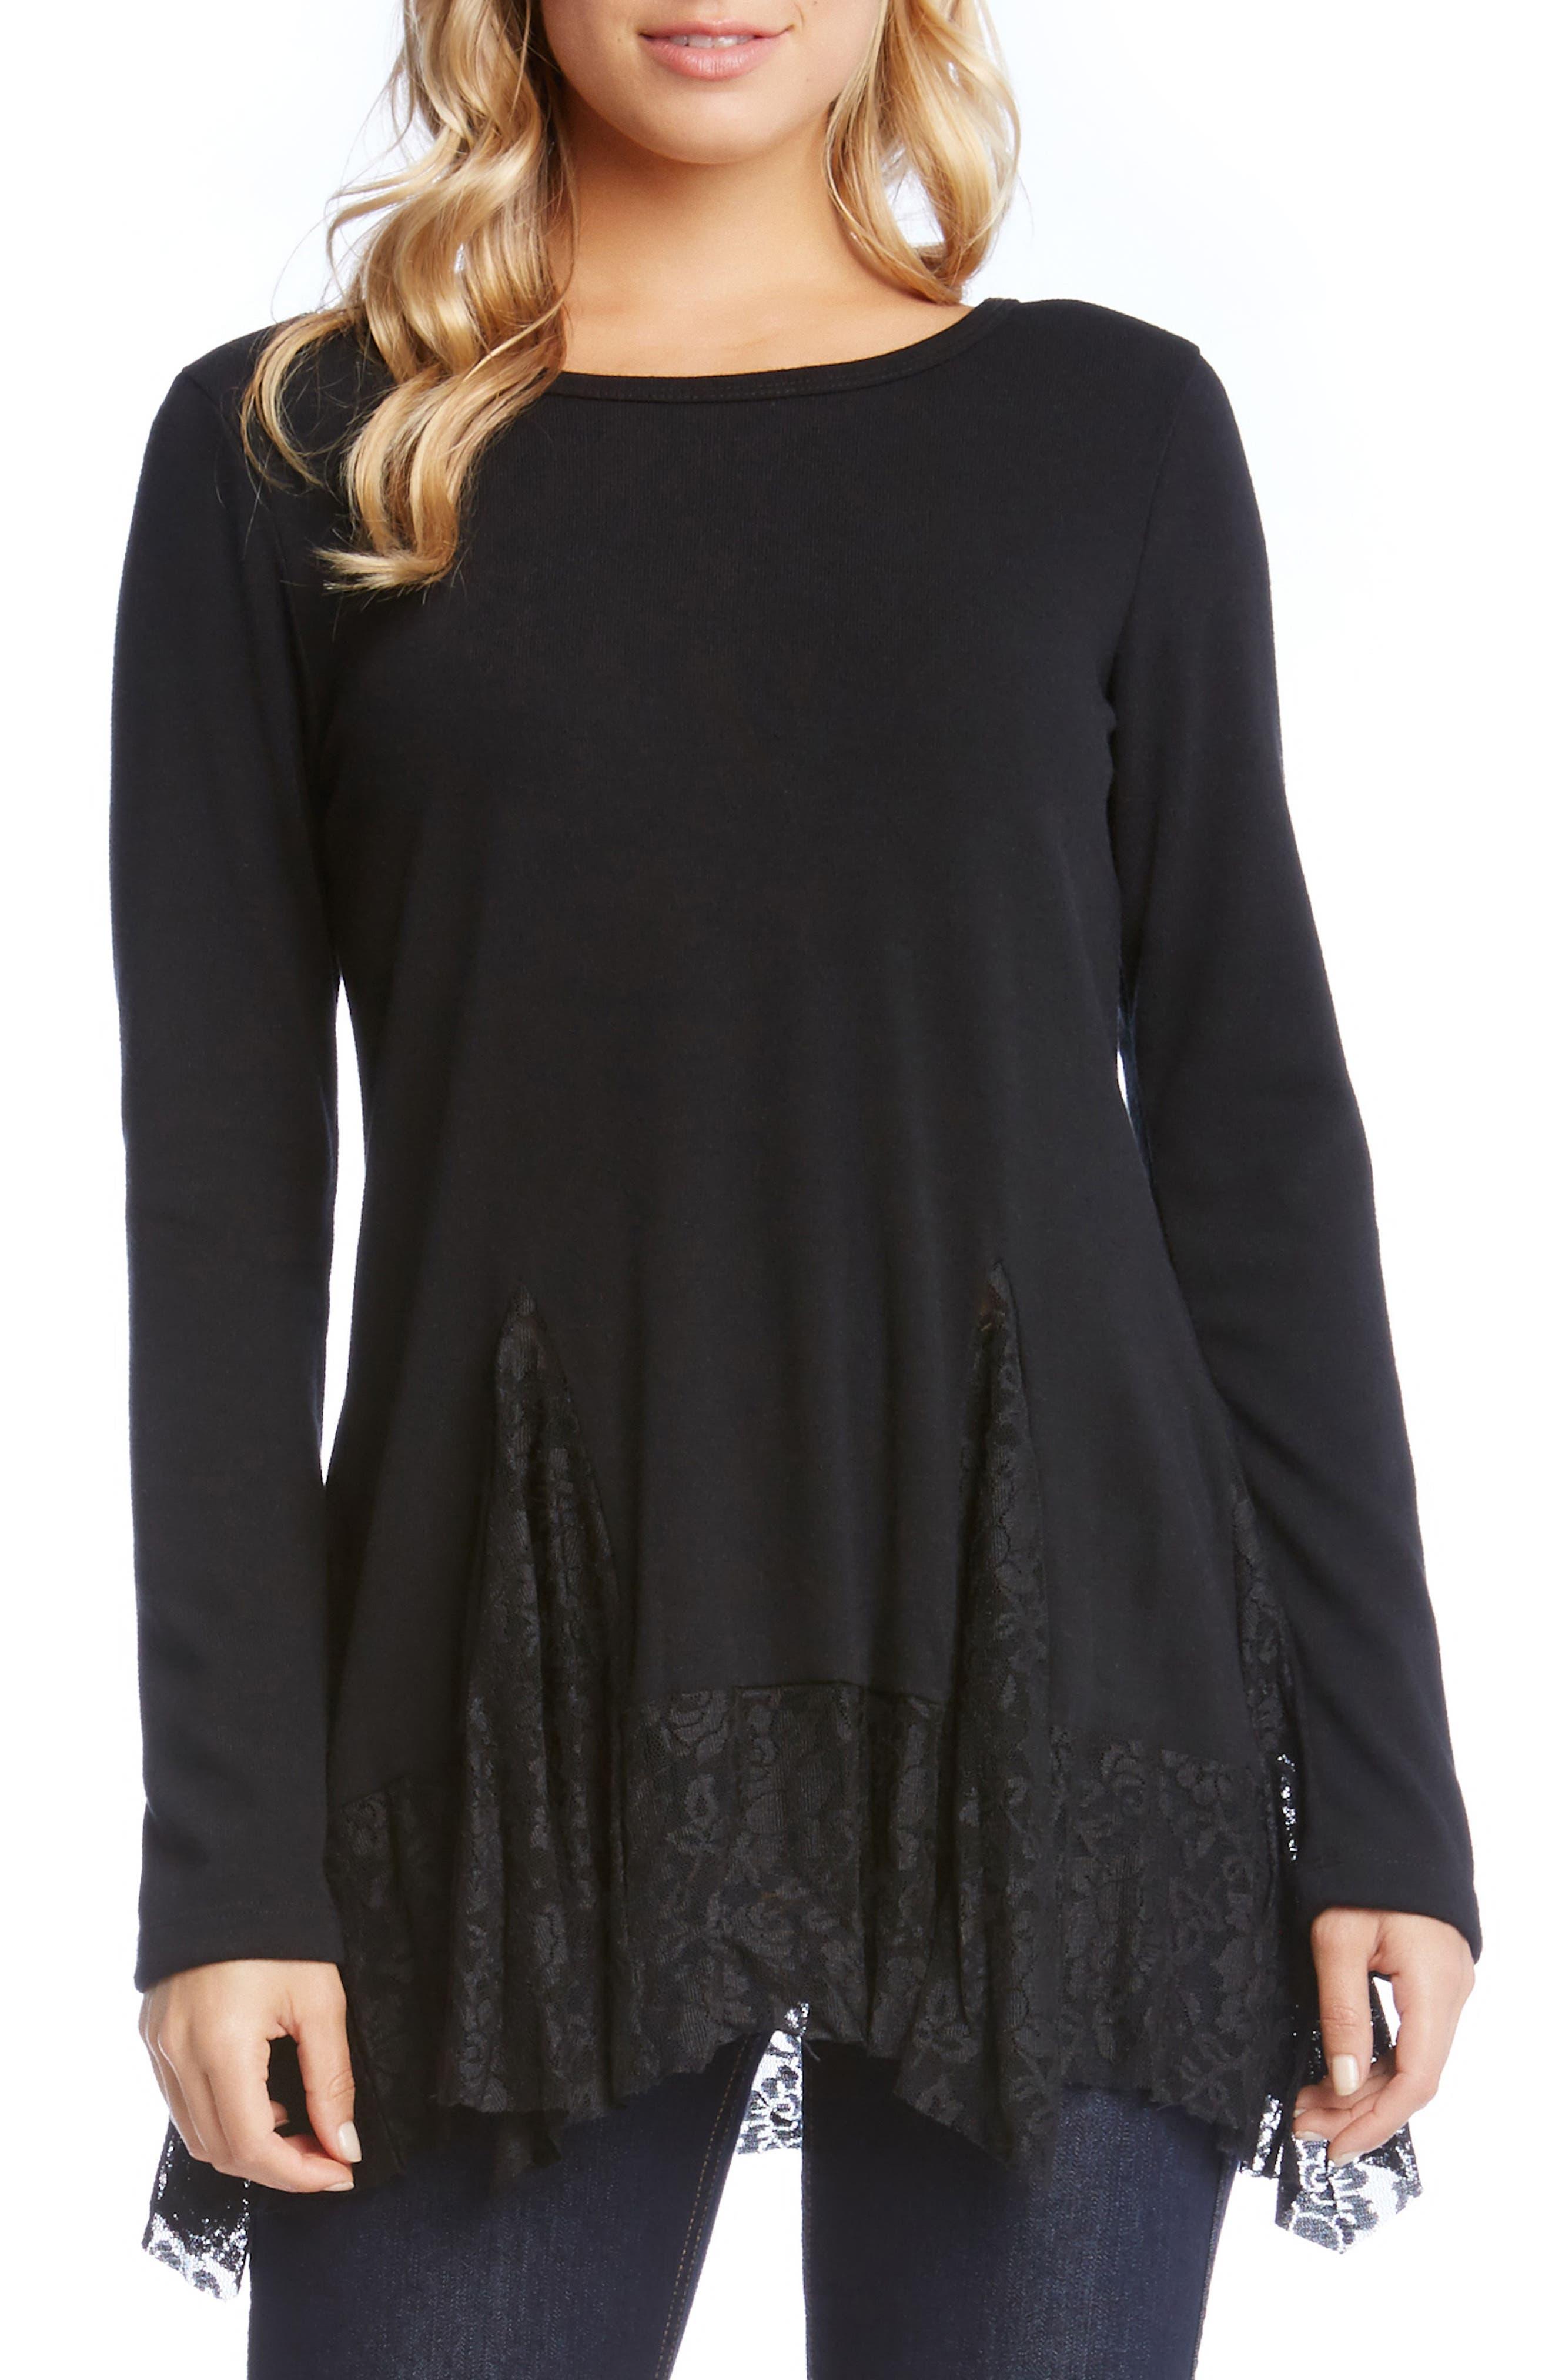 Alternate Image 1 Selected - Karen Karen Lace Inset Sweater